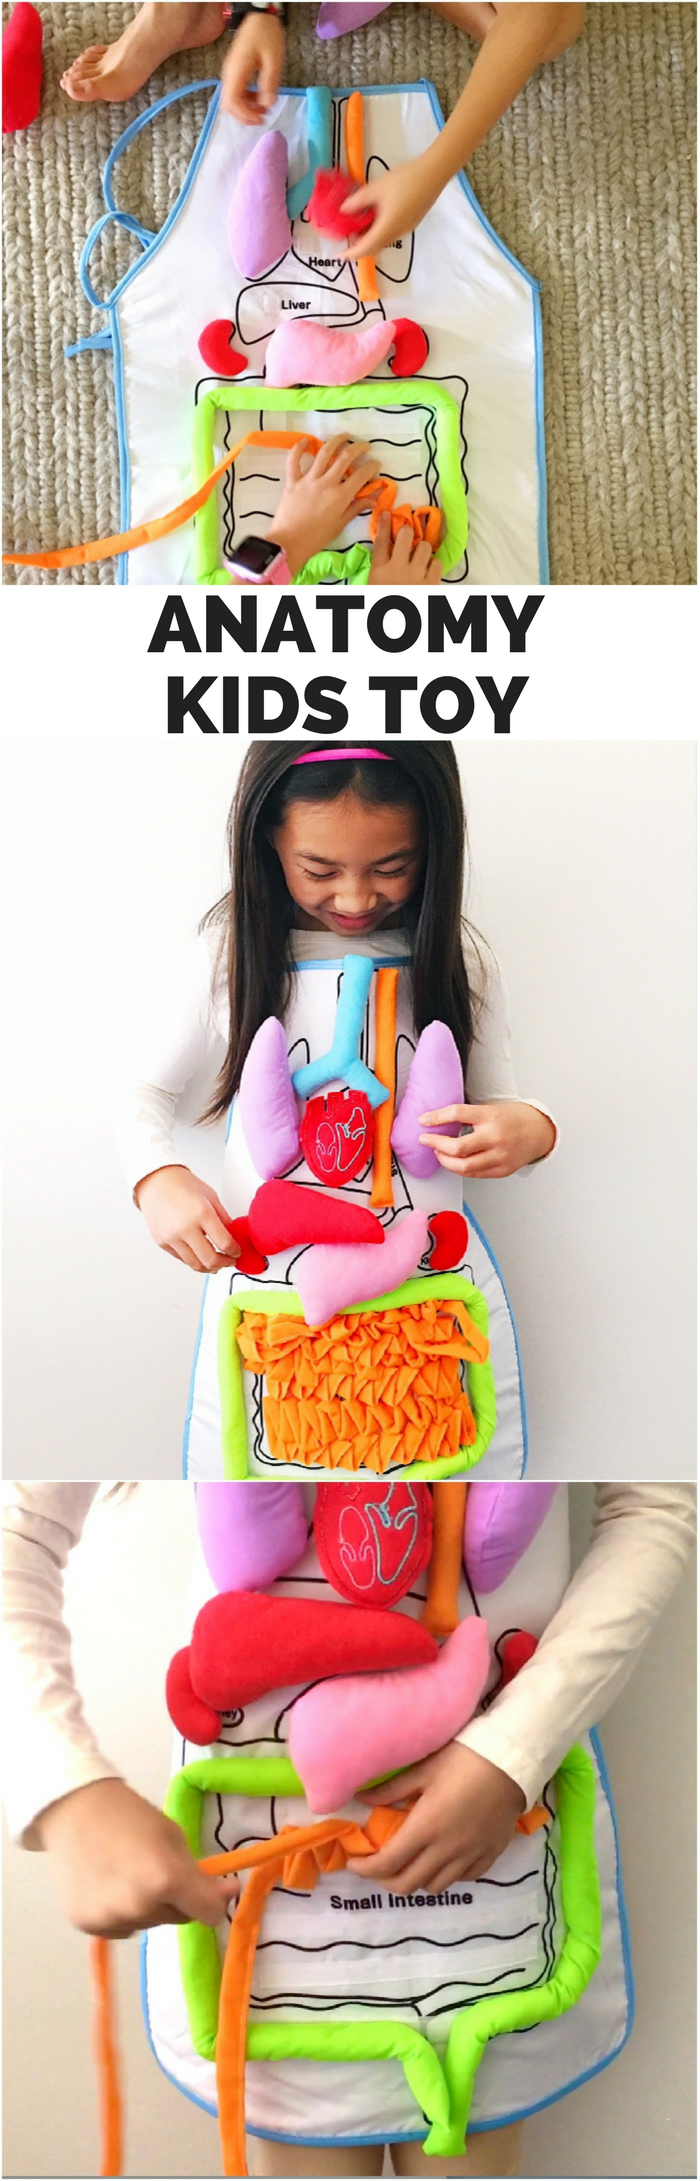 Fun Anatomy Apron Toy For Kids Anatomy Learningtoy Kidstoys